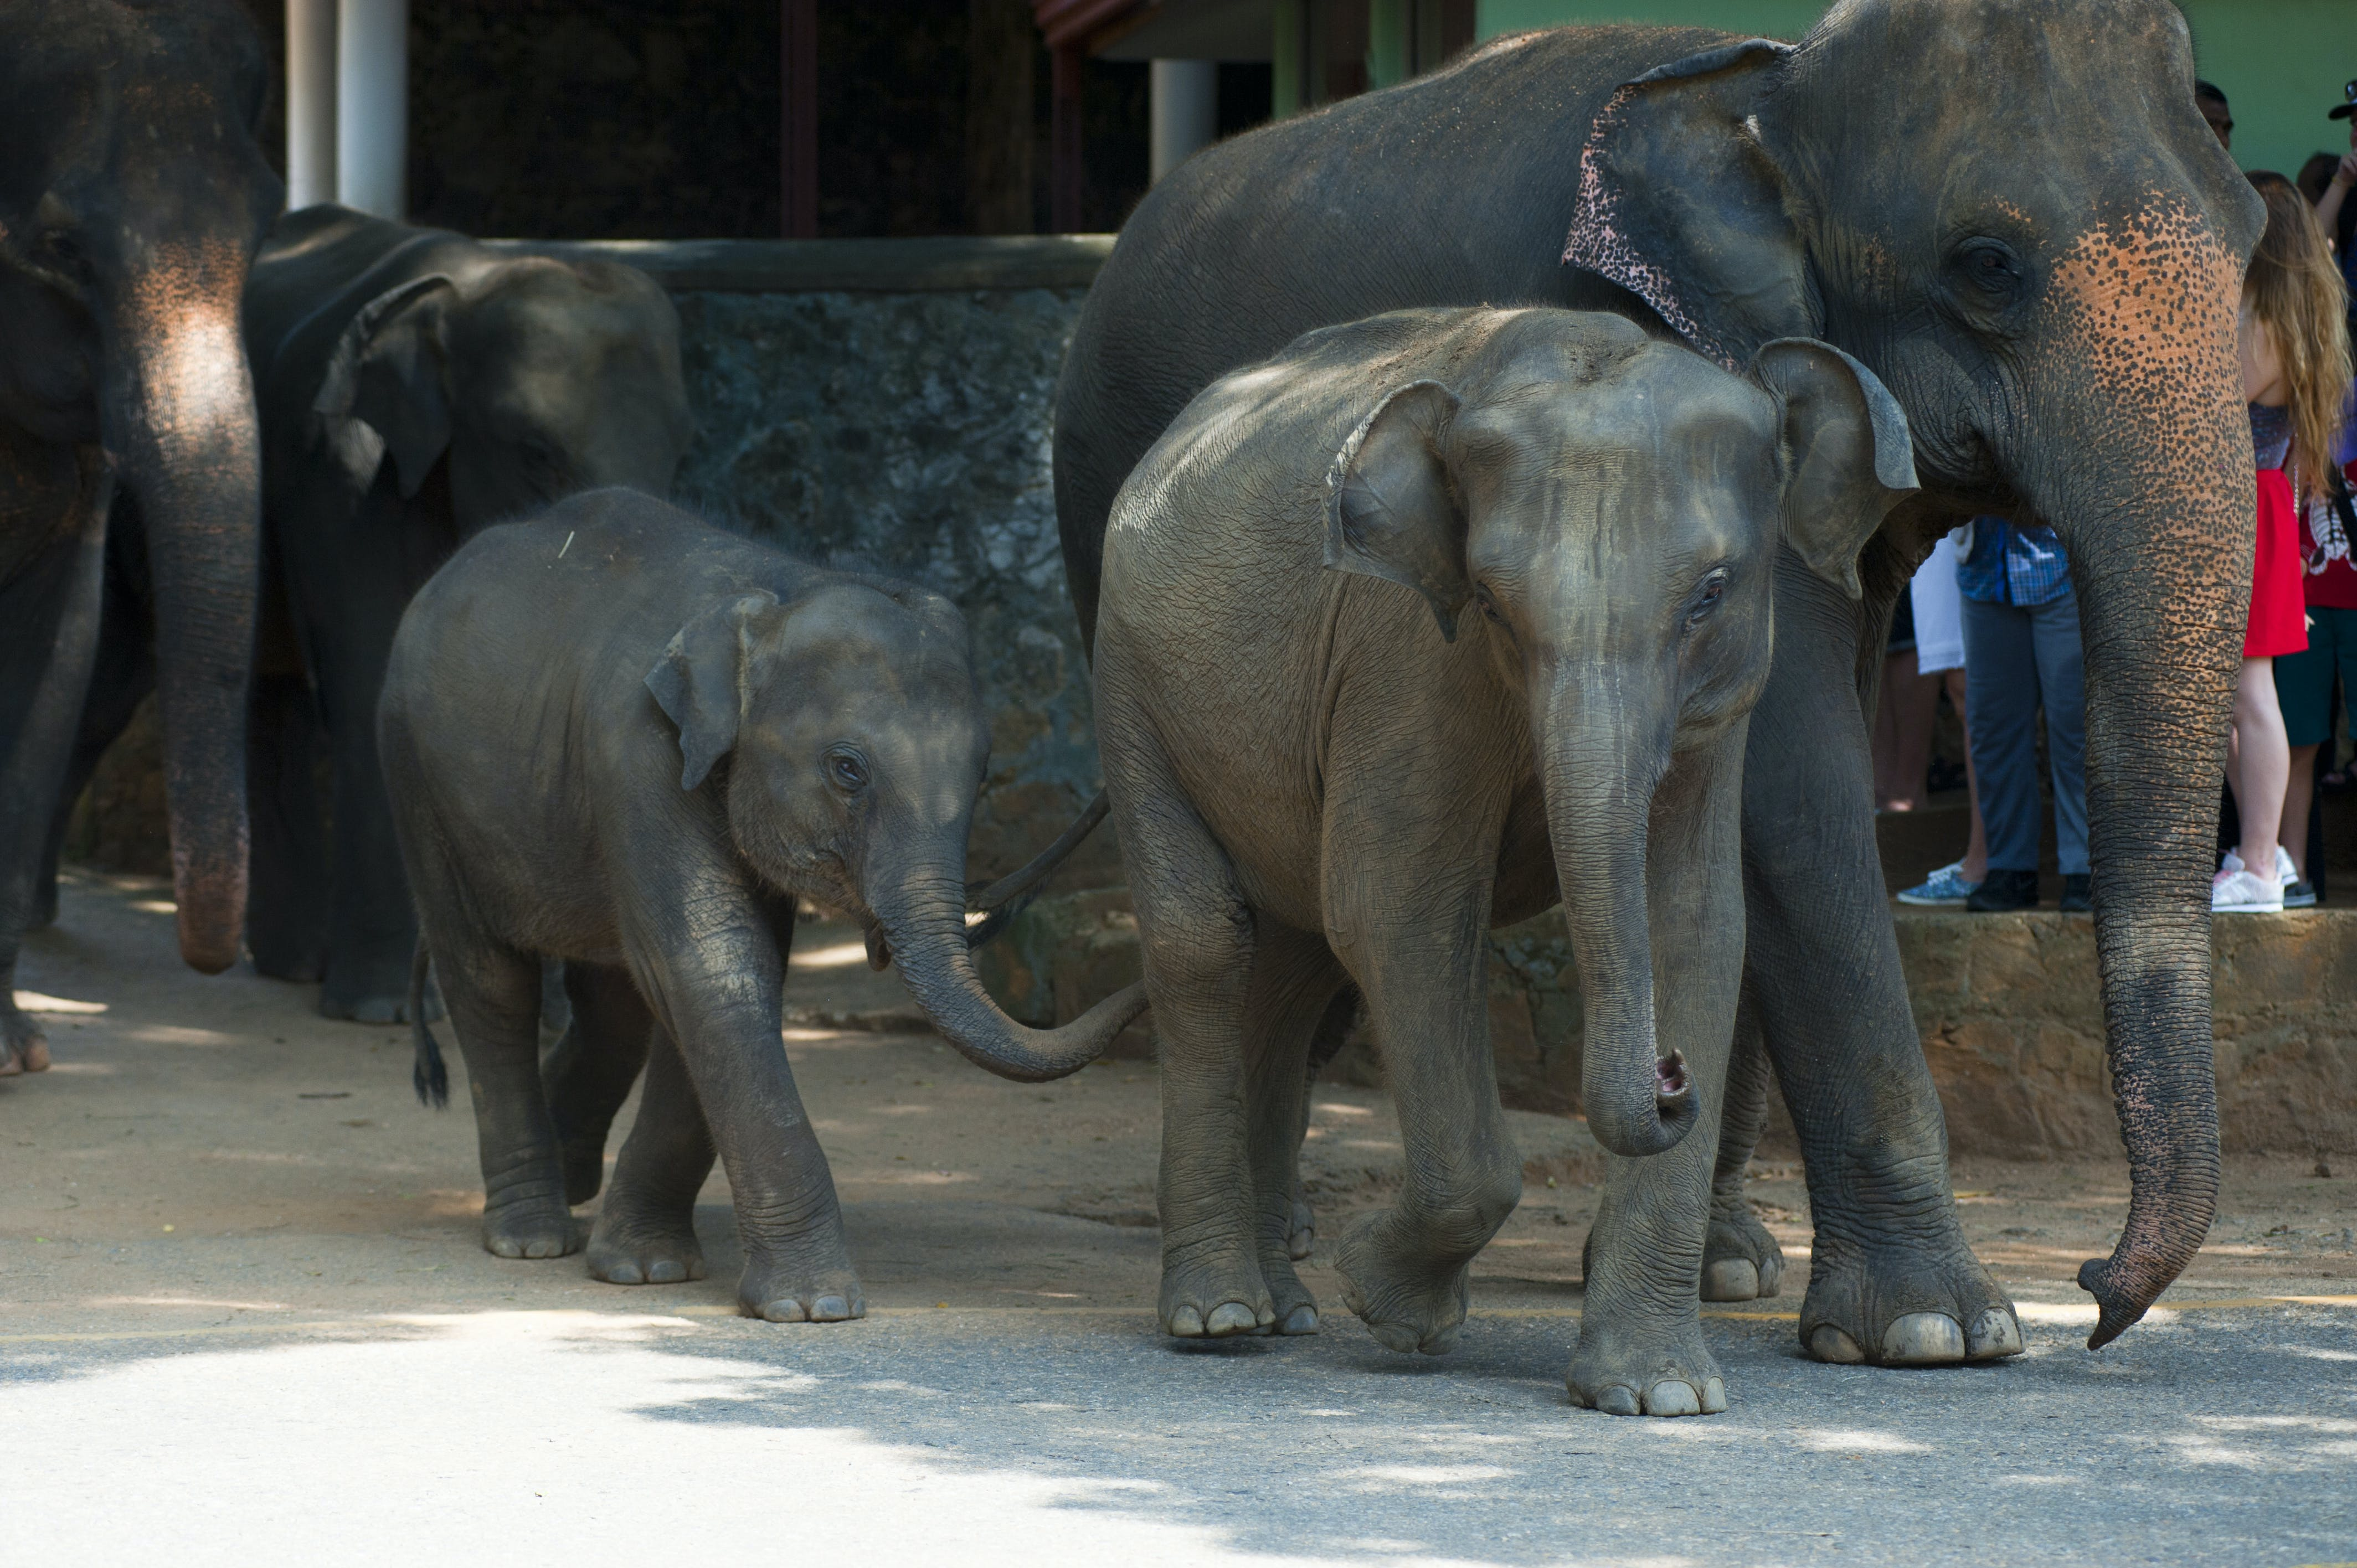 animal, elephant, elephants